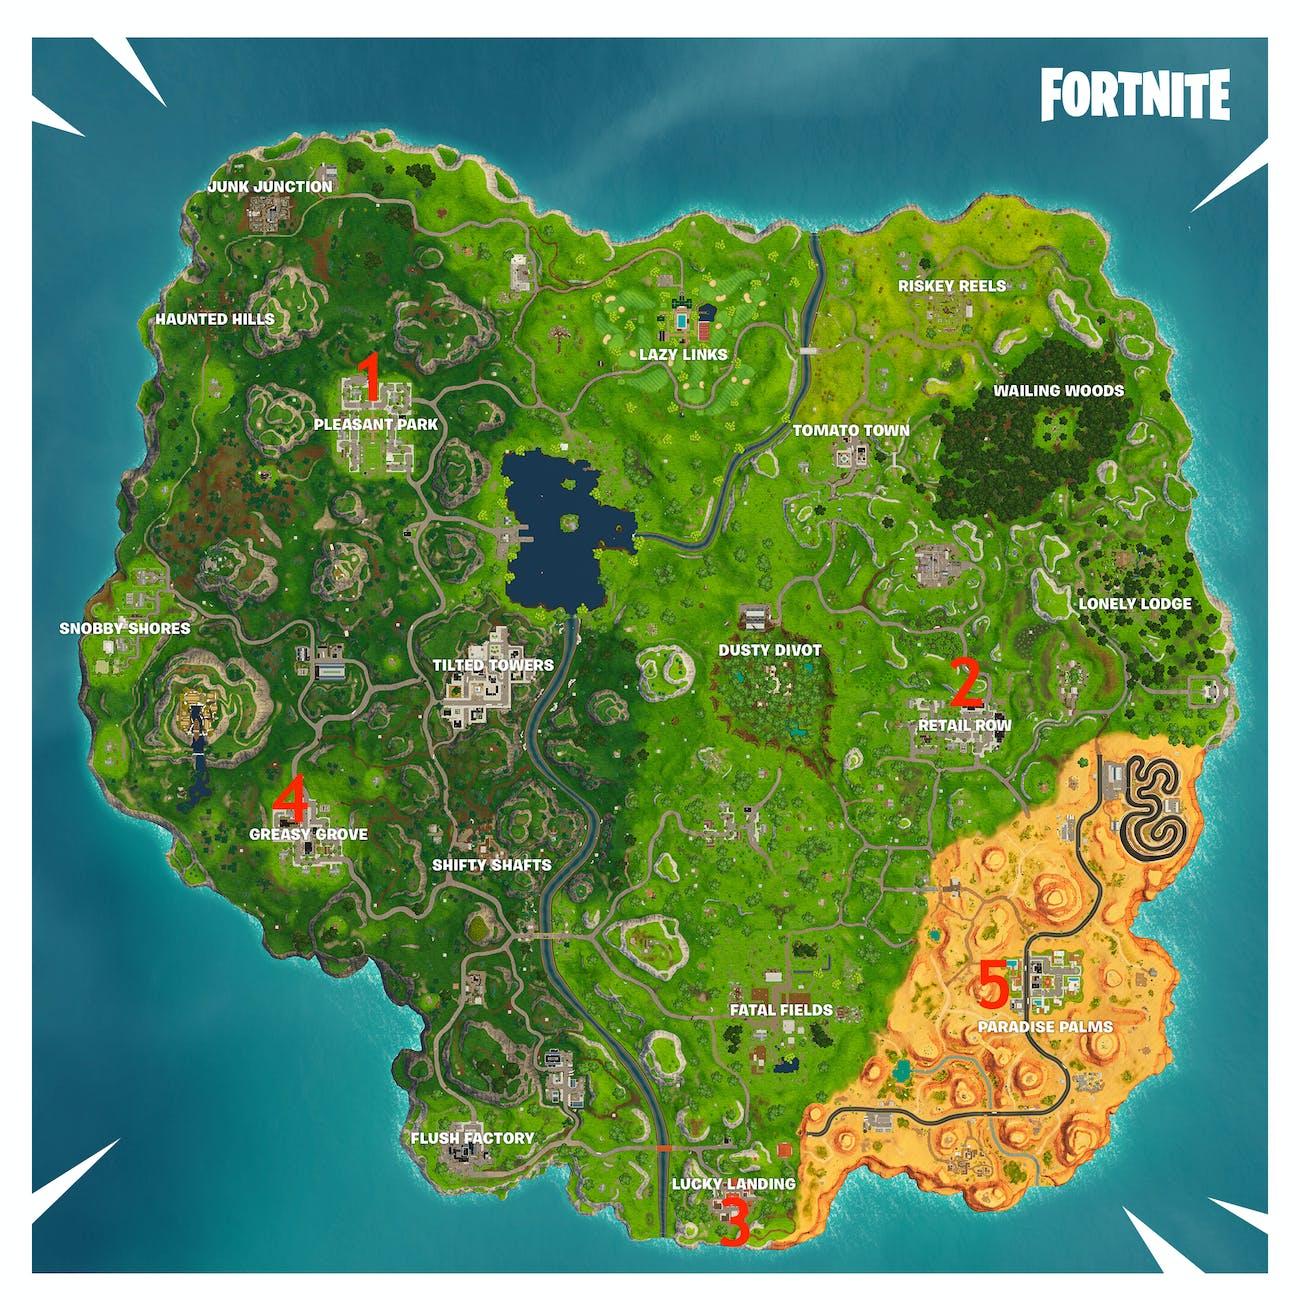 'Fortnite' Week 7 Stage Challenge Chest